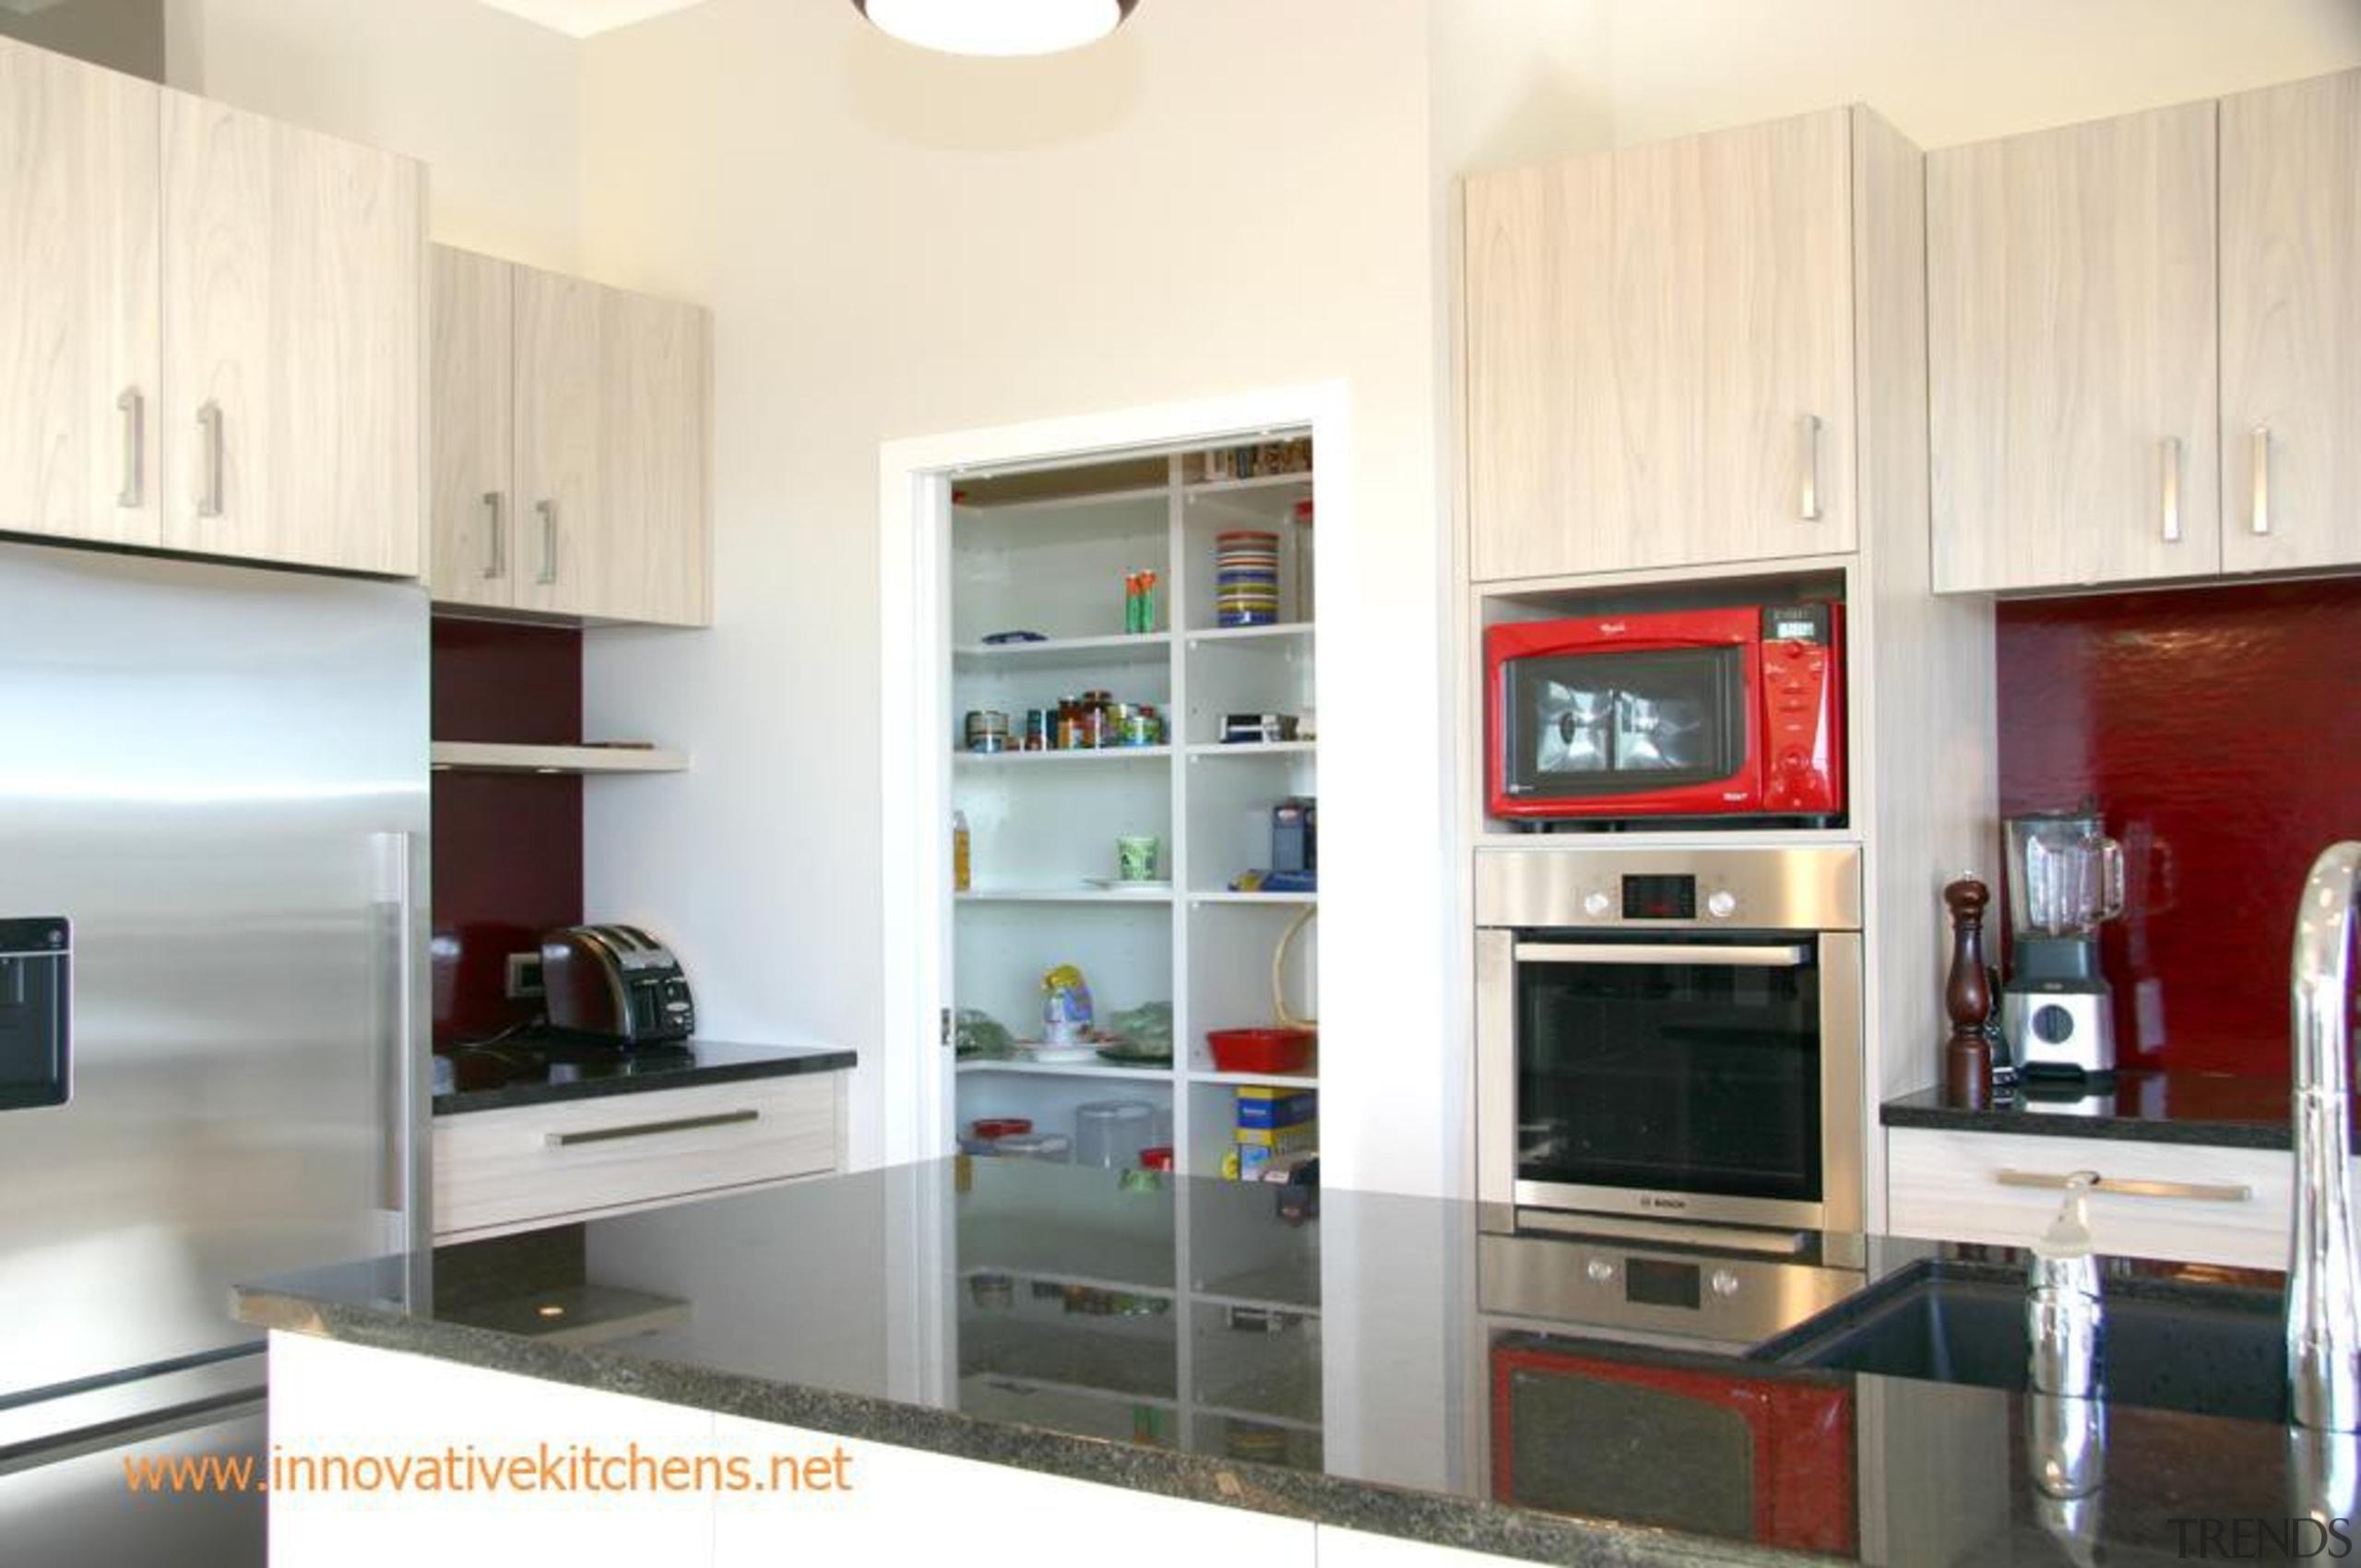 granite bench top - granite bench top - cabinetry, countertop, home appliance, interior design, kitchen, real estate, room, white